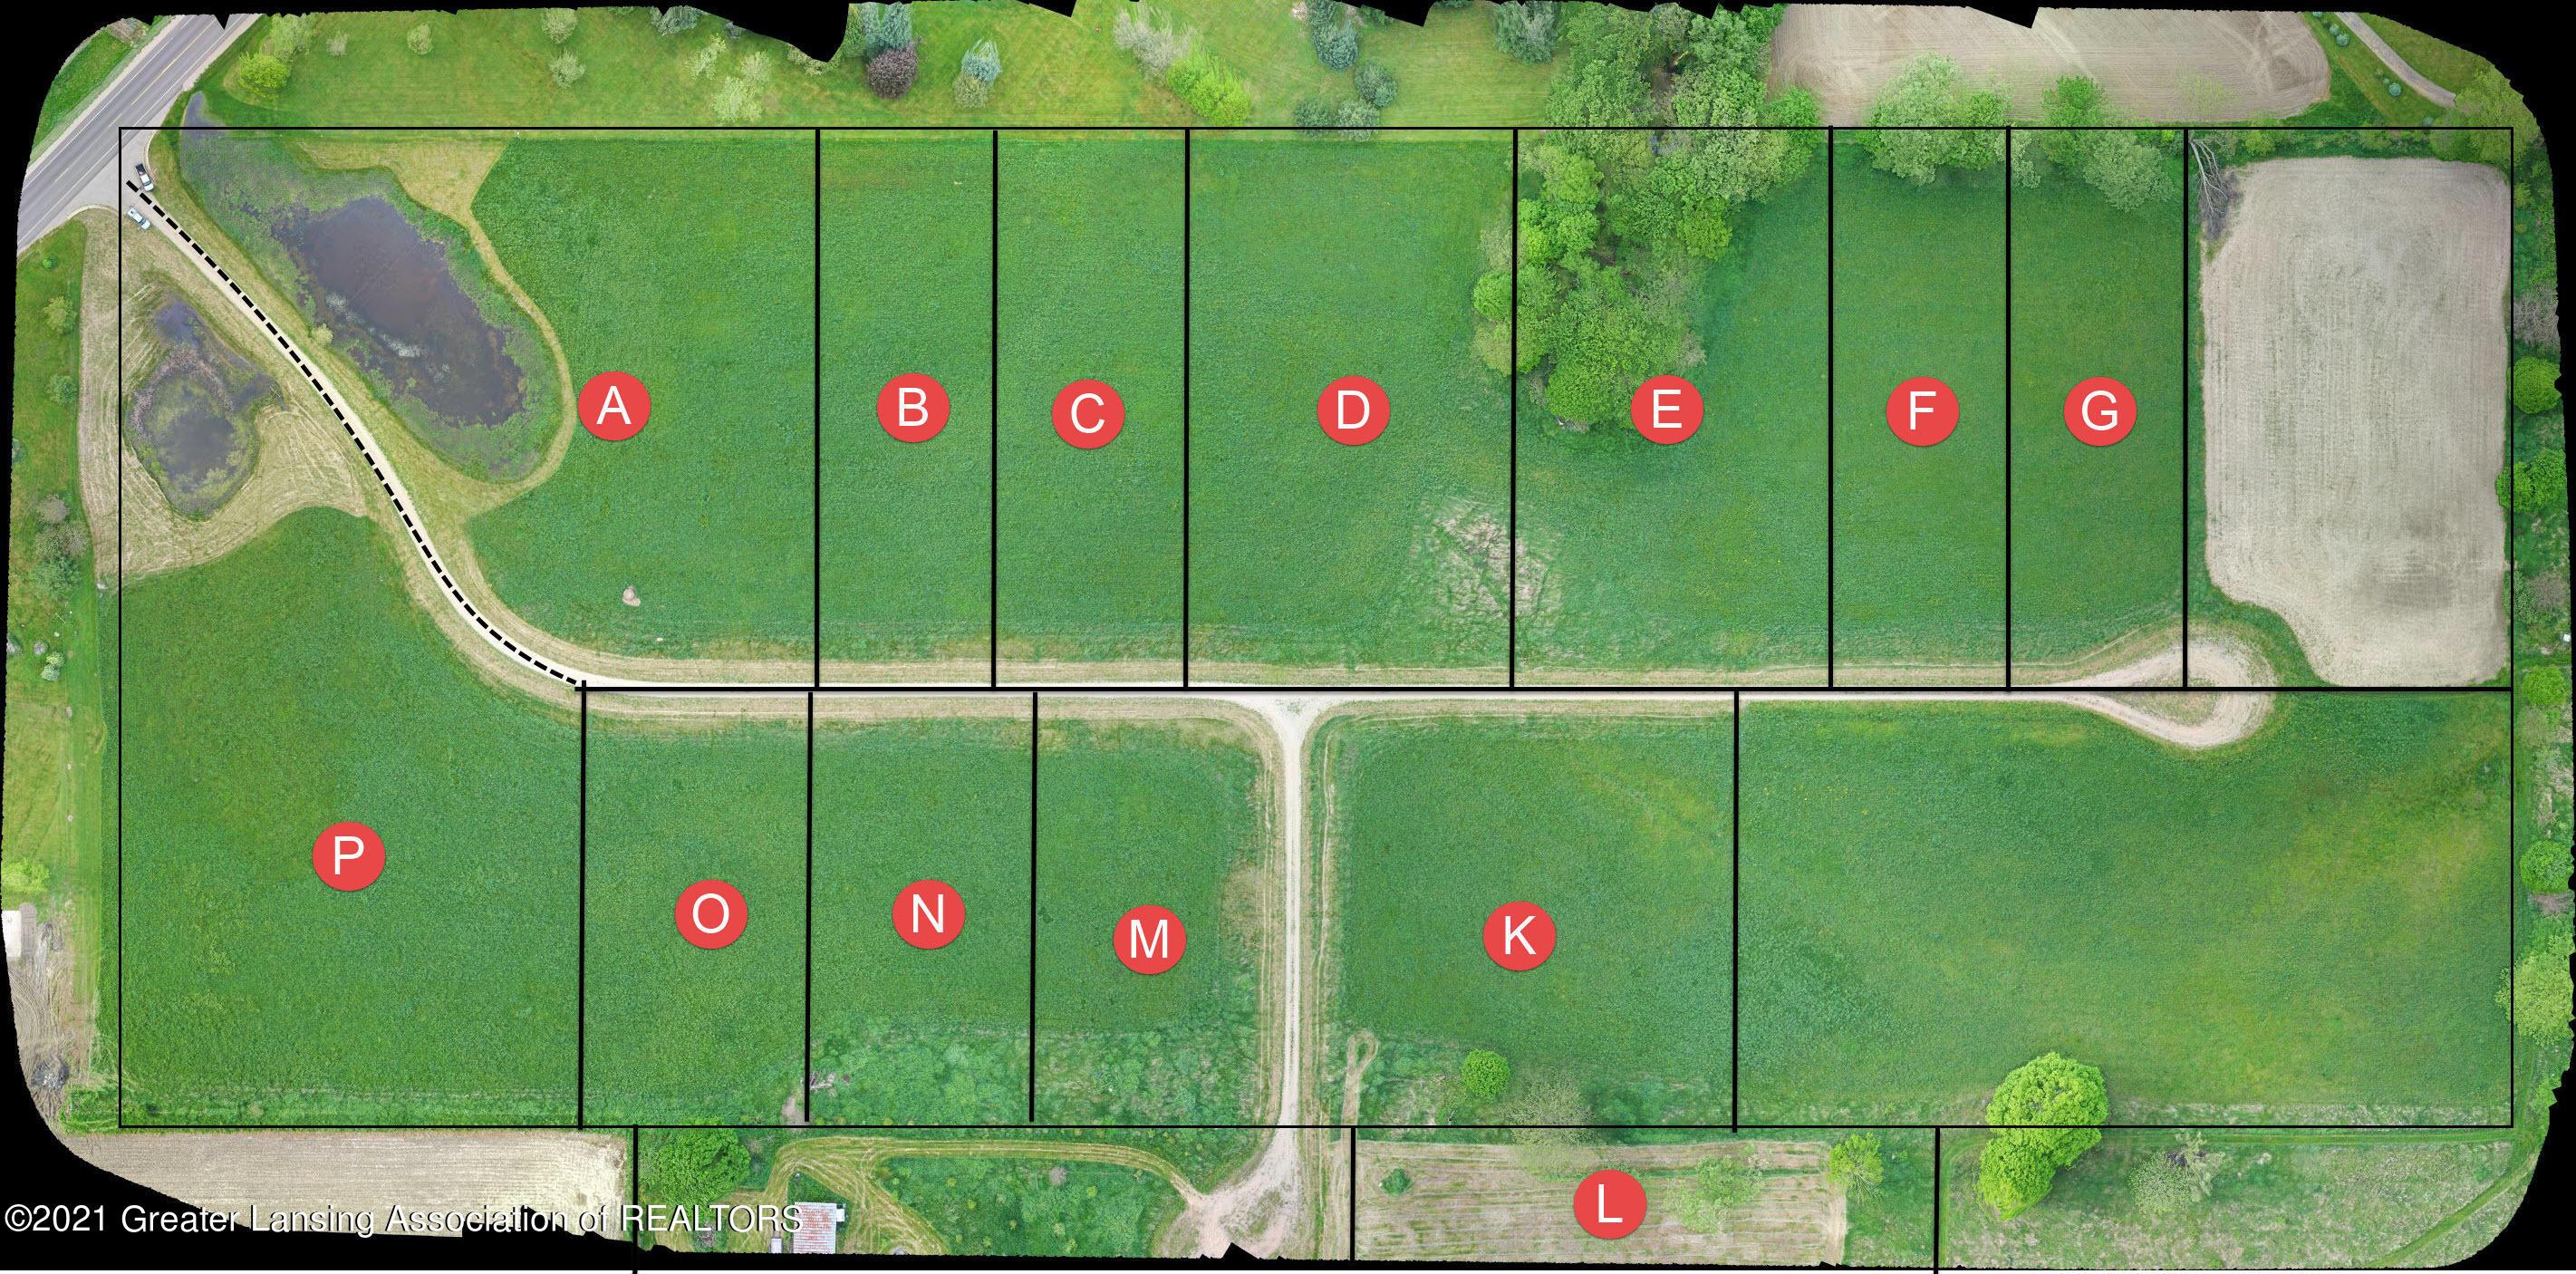 0 Pinebluff Dr., Parcel E - 1 Overview - Pinebluff Estates - 1